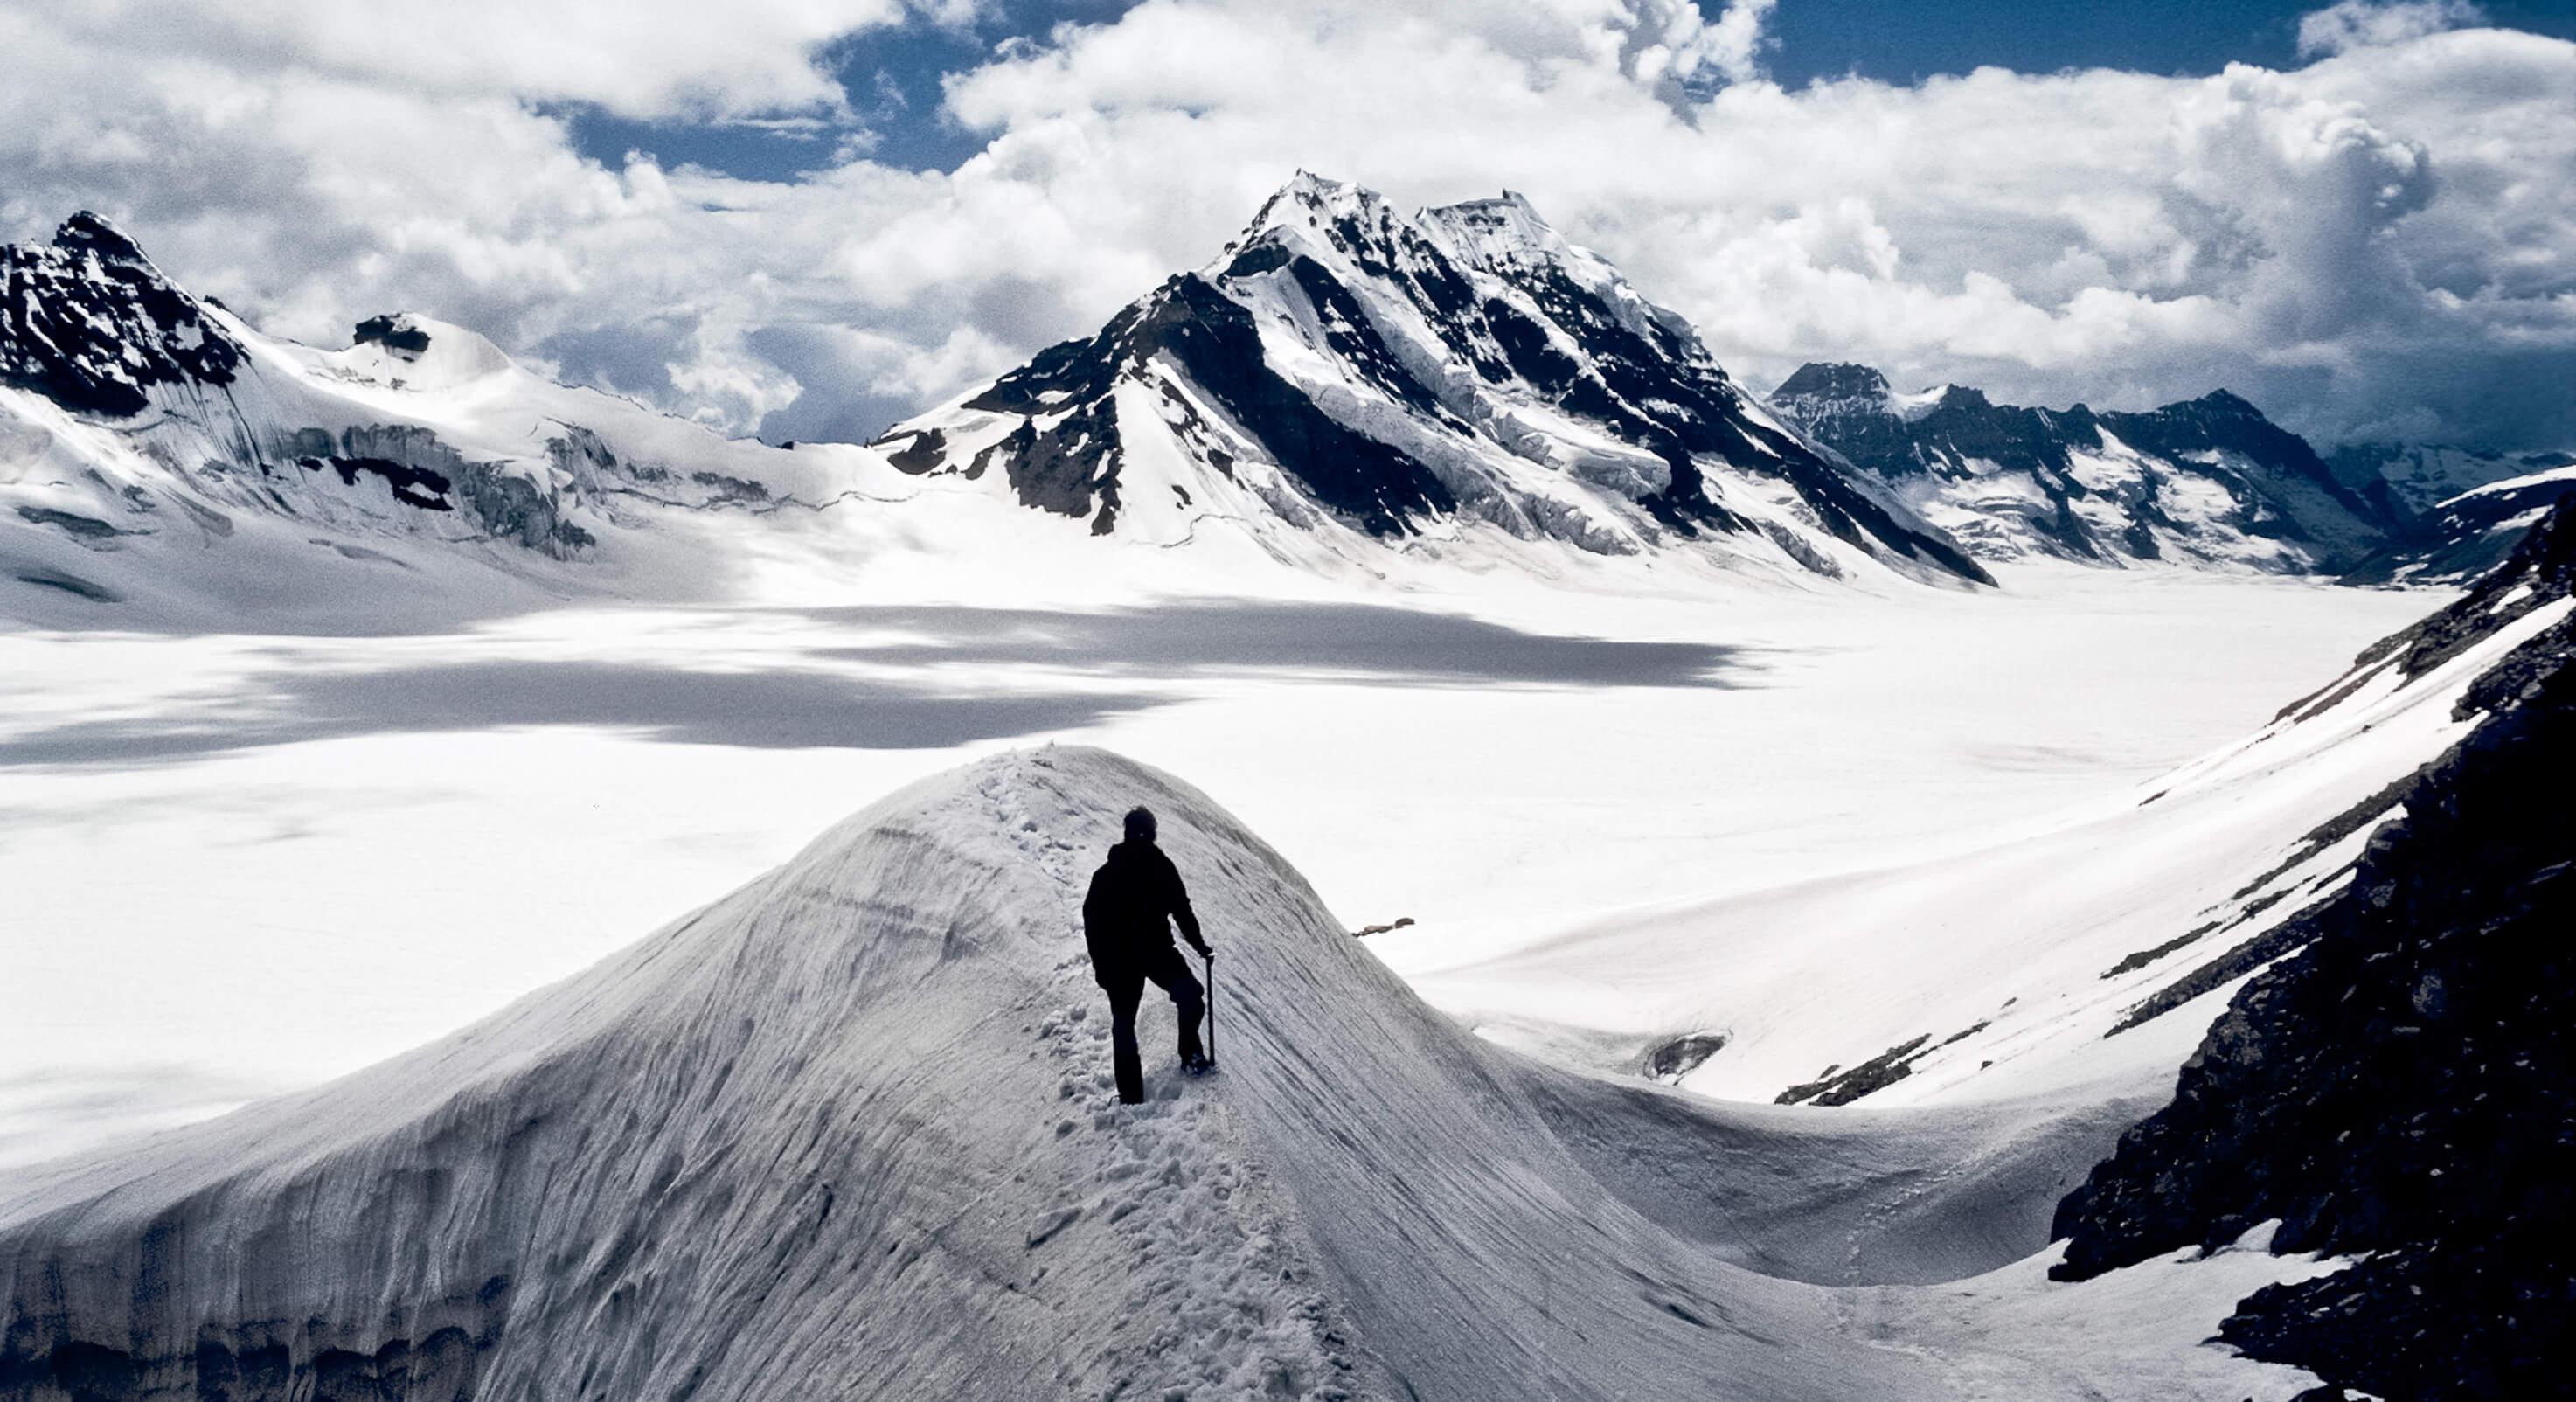 Paul-Mayewski-Mountain